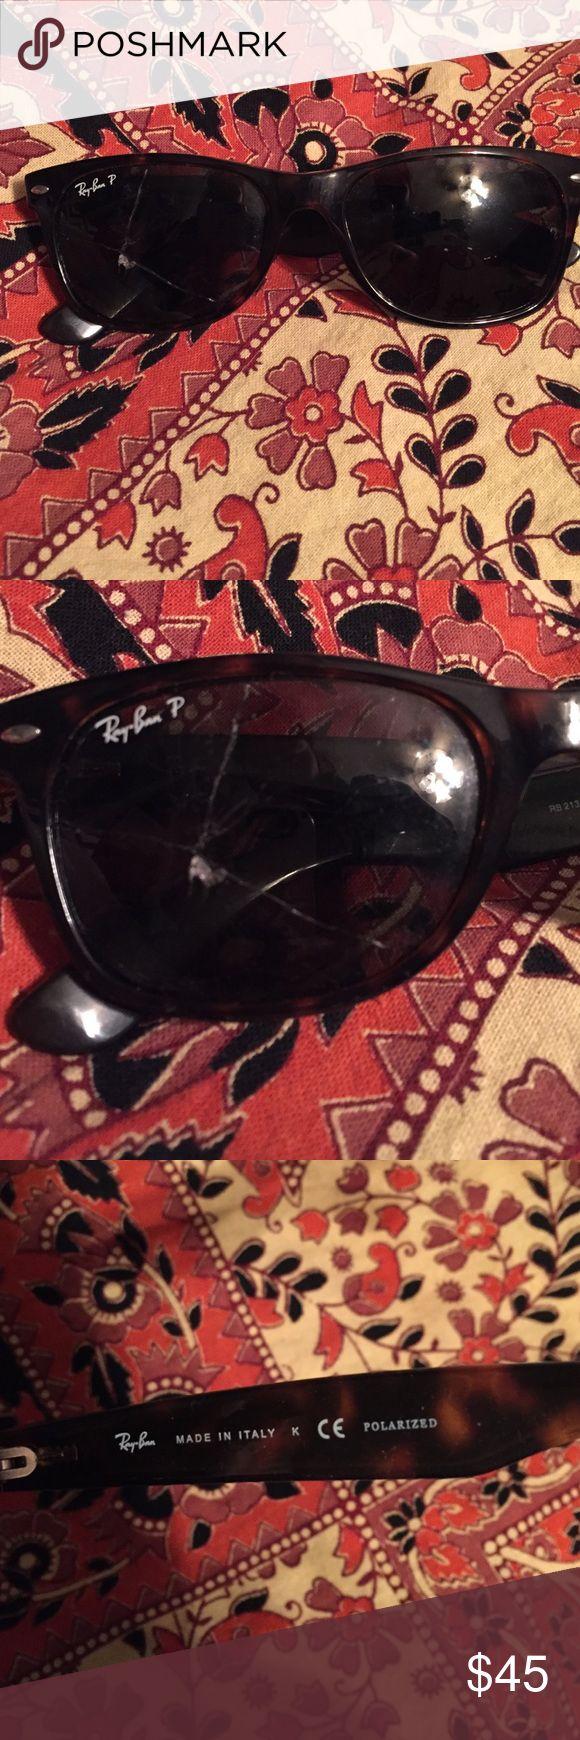 sunglass repair fkos  Gafas De Sol Wayfarer, Mirado En L铆nea, Wayfarer Style, Ban Wayfarer,  Cracked Ray, Sunglass Repair, Bans Tortoise, Sunglasses Genuine, Genuine Ray